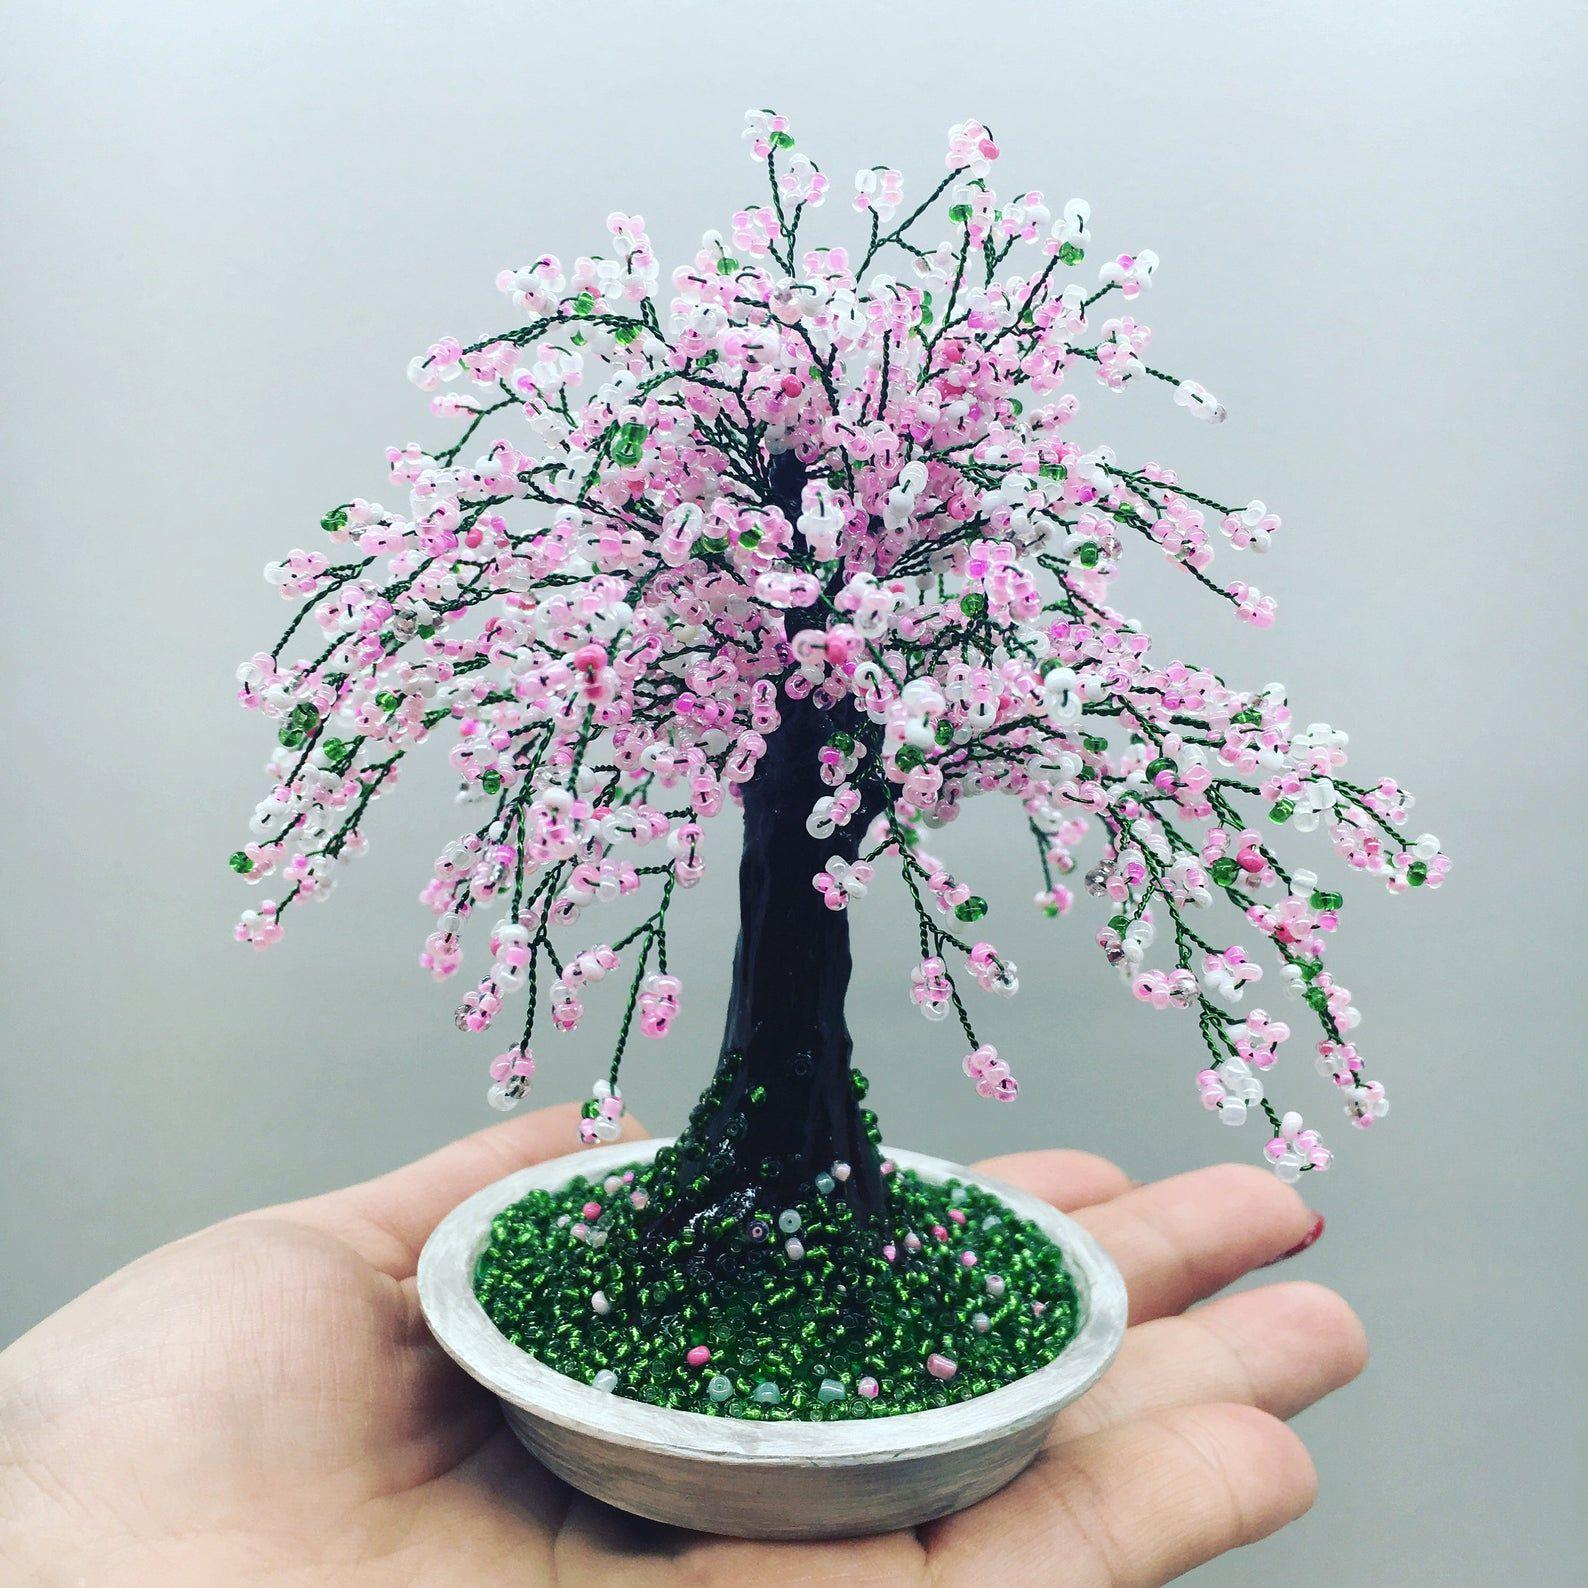 Cherry Blossom Bonsai Trees Sakura Beaded Bonsai Tree Wire Etsy In 2021 Wire Tree Sculpture Cherry Blossom Bonsai Tree Tree Sculpture